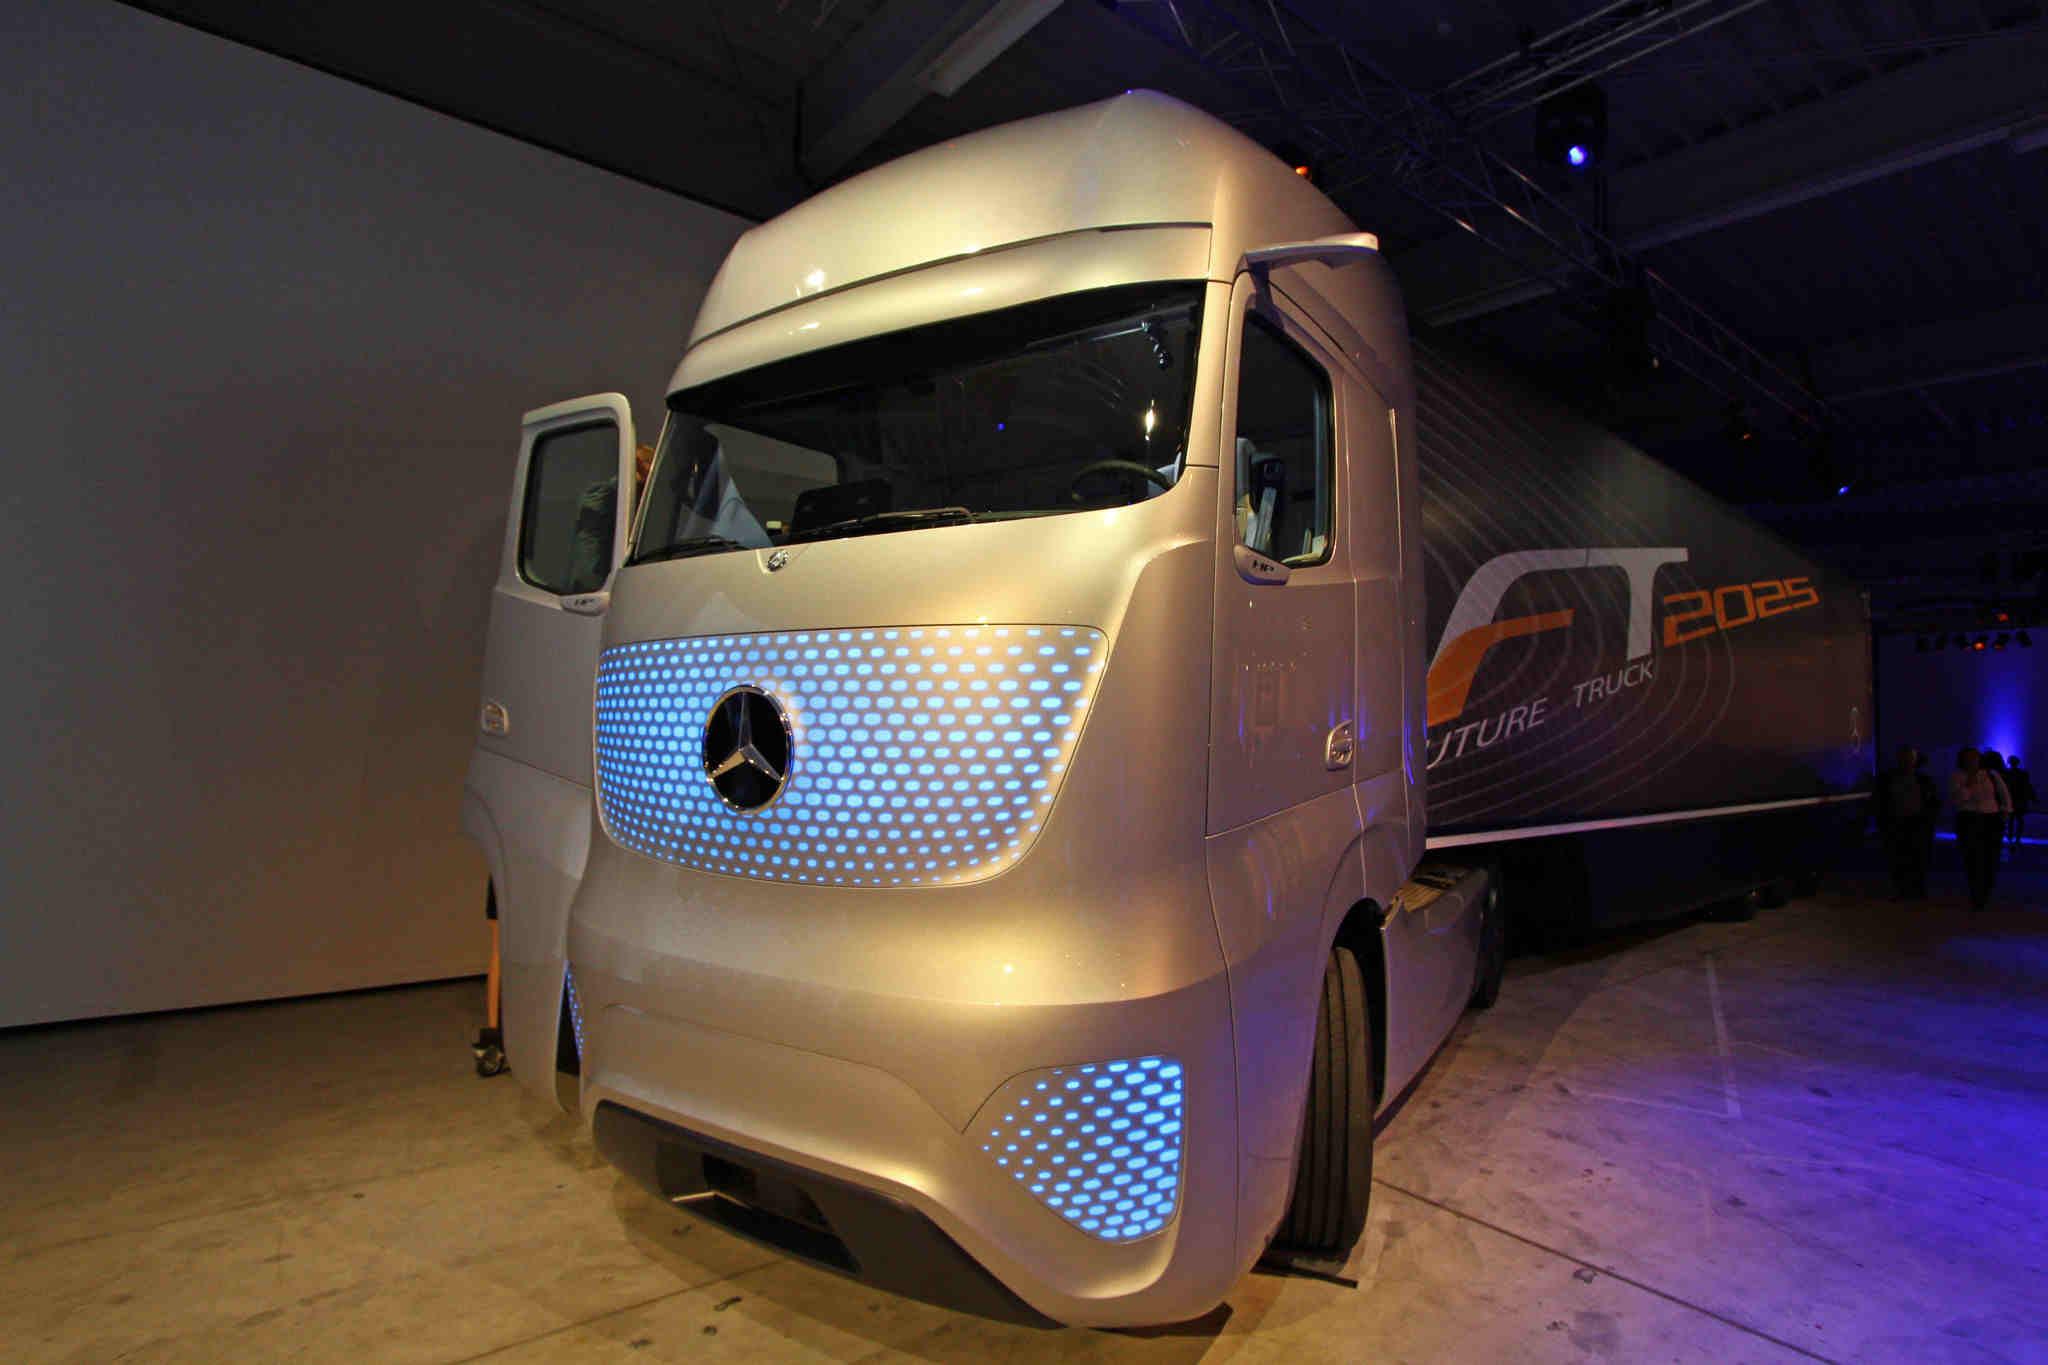 Mercedes Benz Future Truck 2025 Makes Its Debut At The Iaa